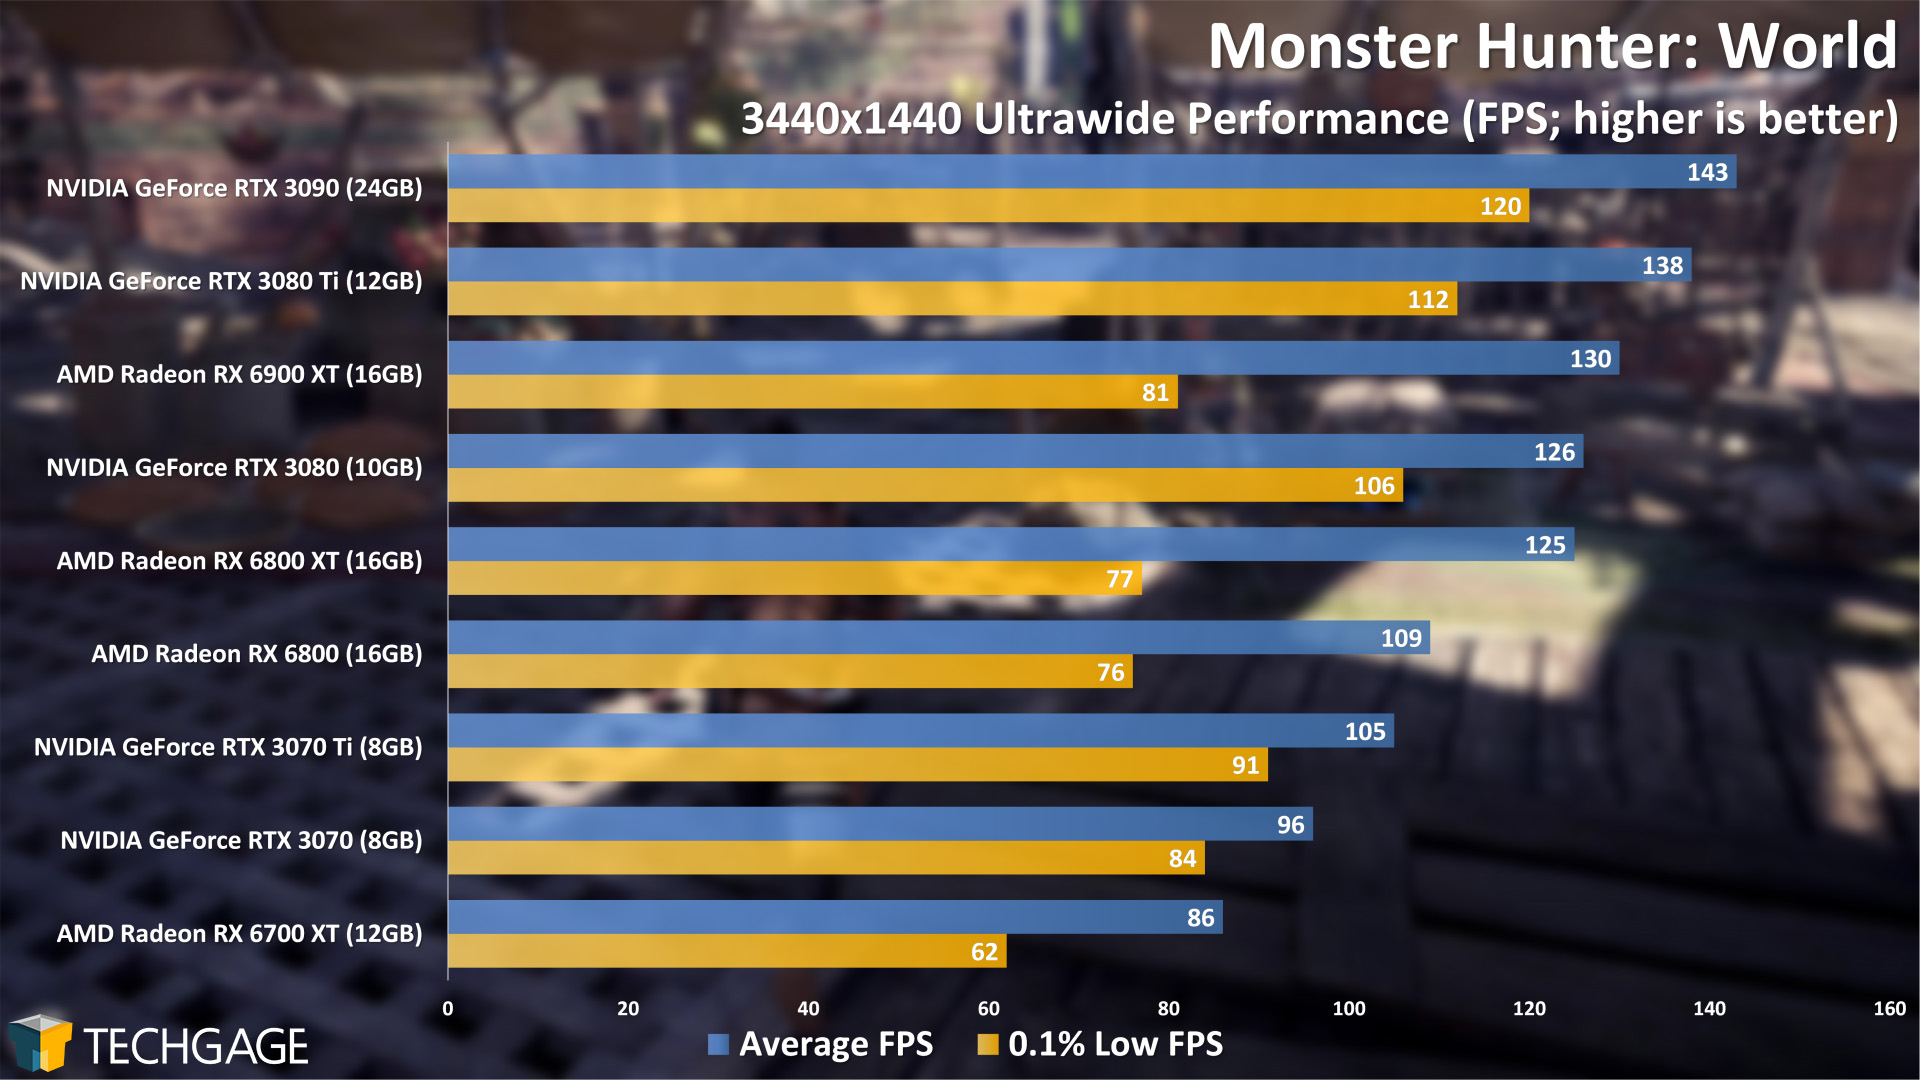 Monster Hunter World - 3440x1440 Ultrawide Performance (NVIDIA GeForce RTX 3070 Ti)